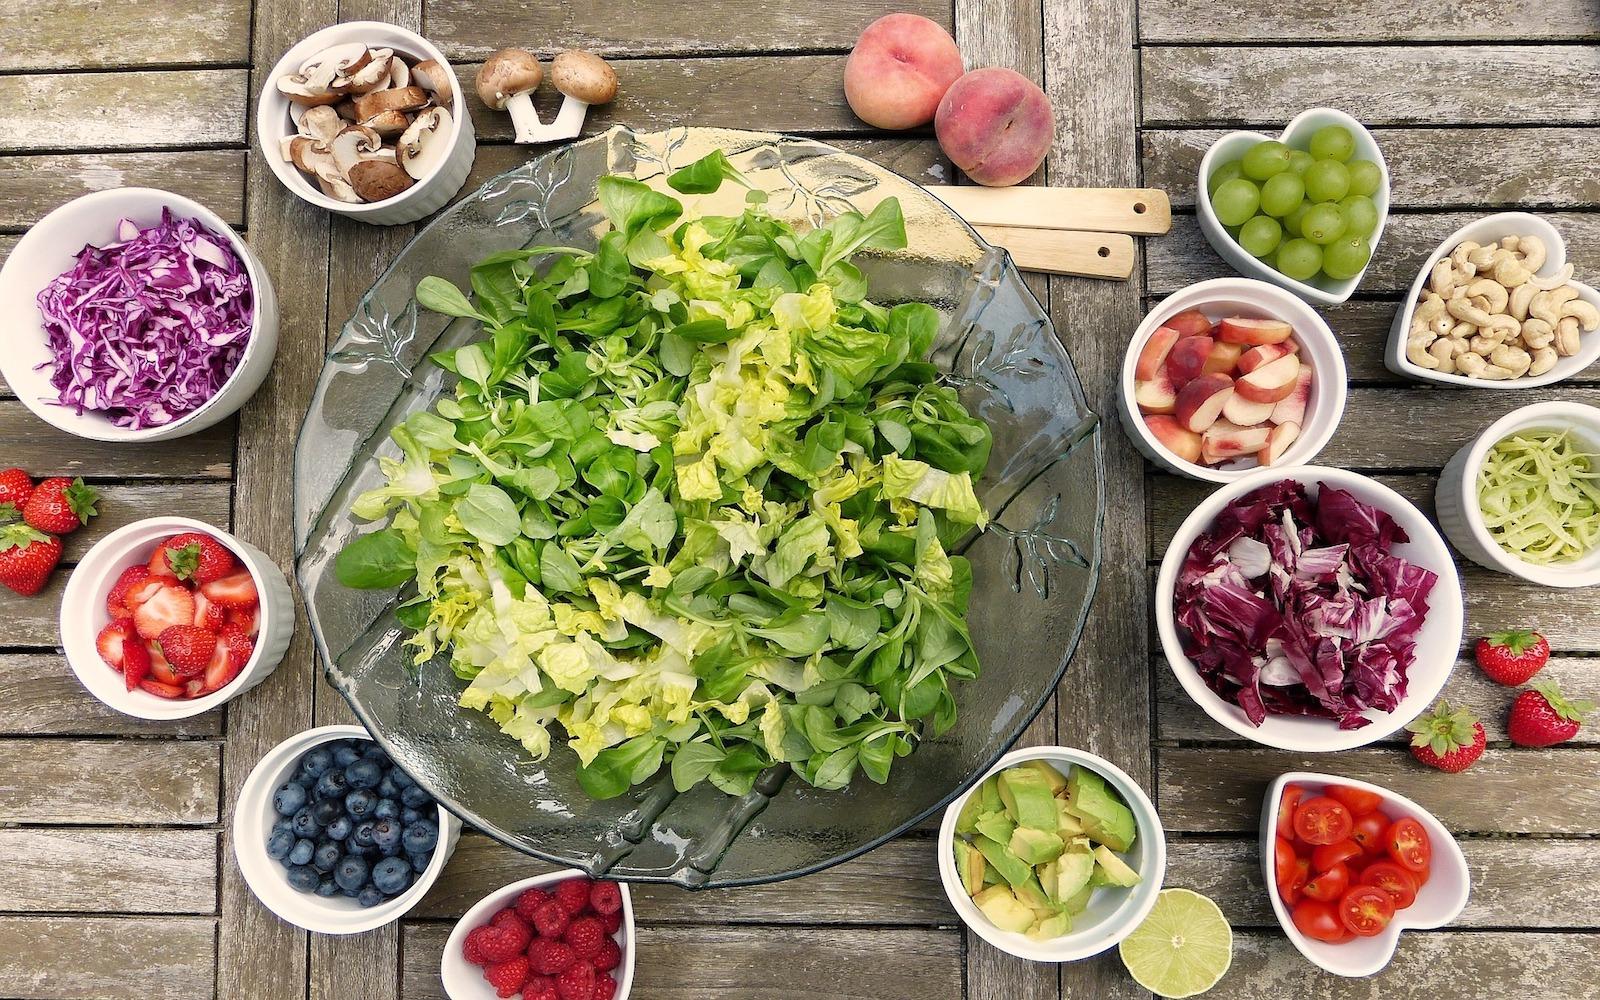 Salad ingredients on table